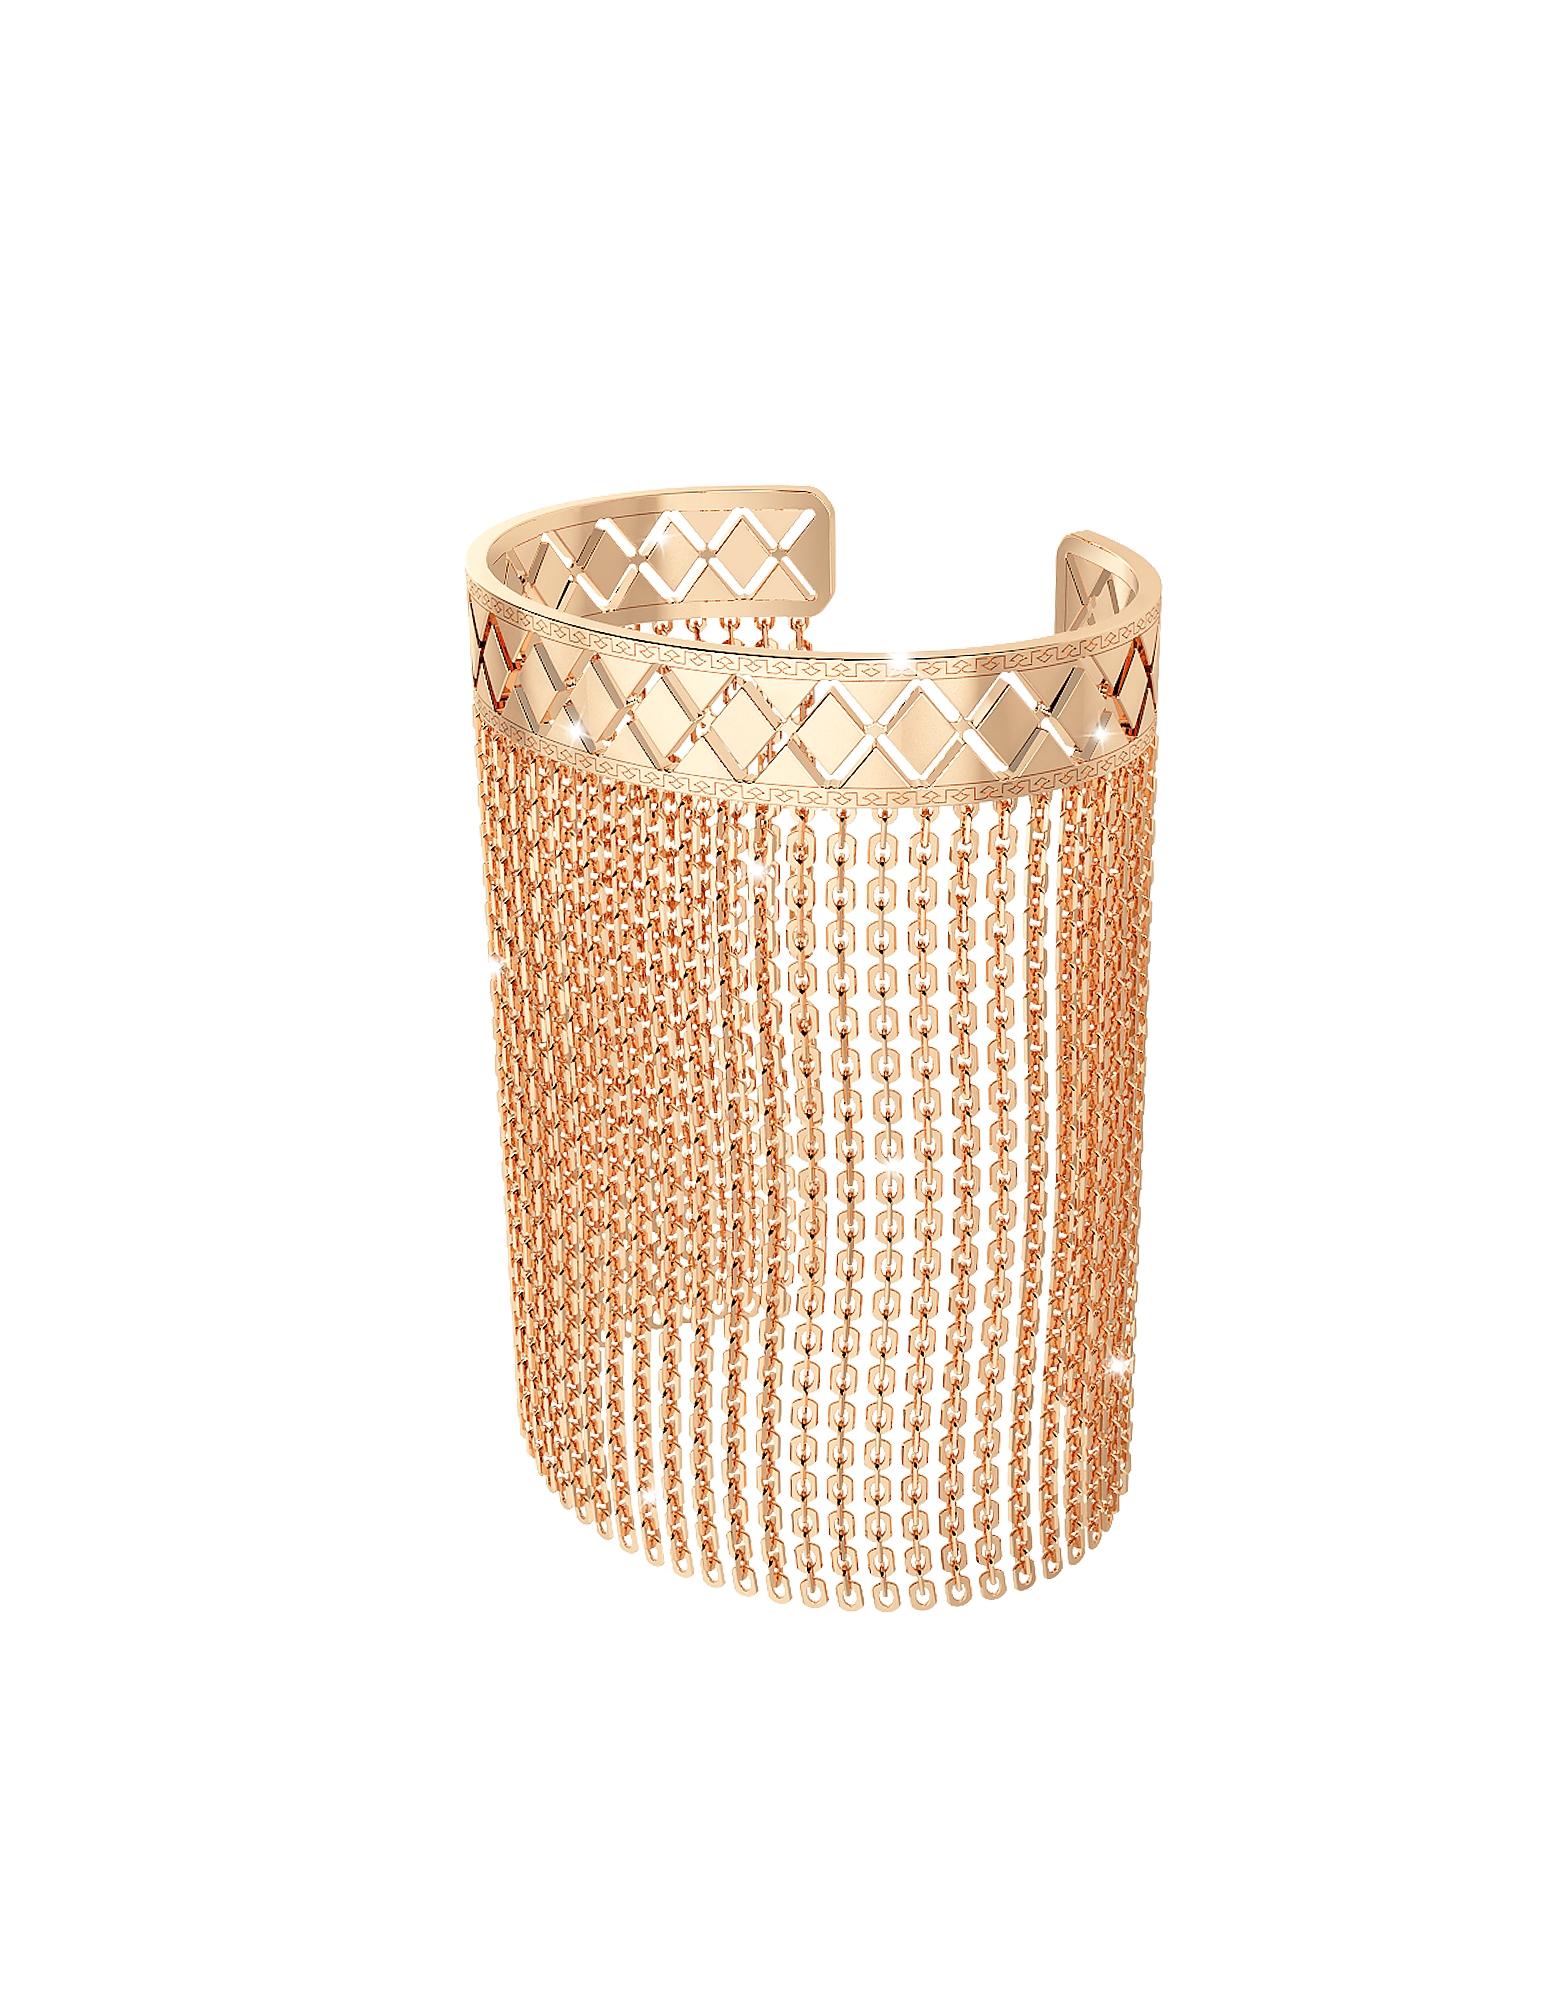 Image of Rebecca Designer Bracelets, Melrose Yellow Gold Over Bronze Mesh Bracelet